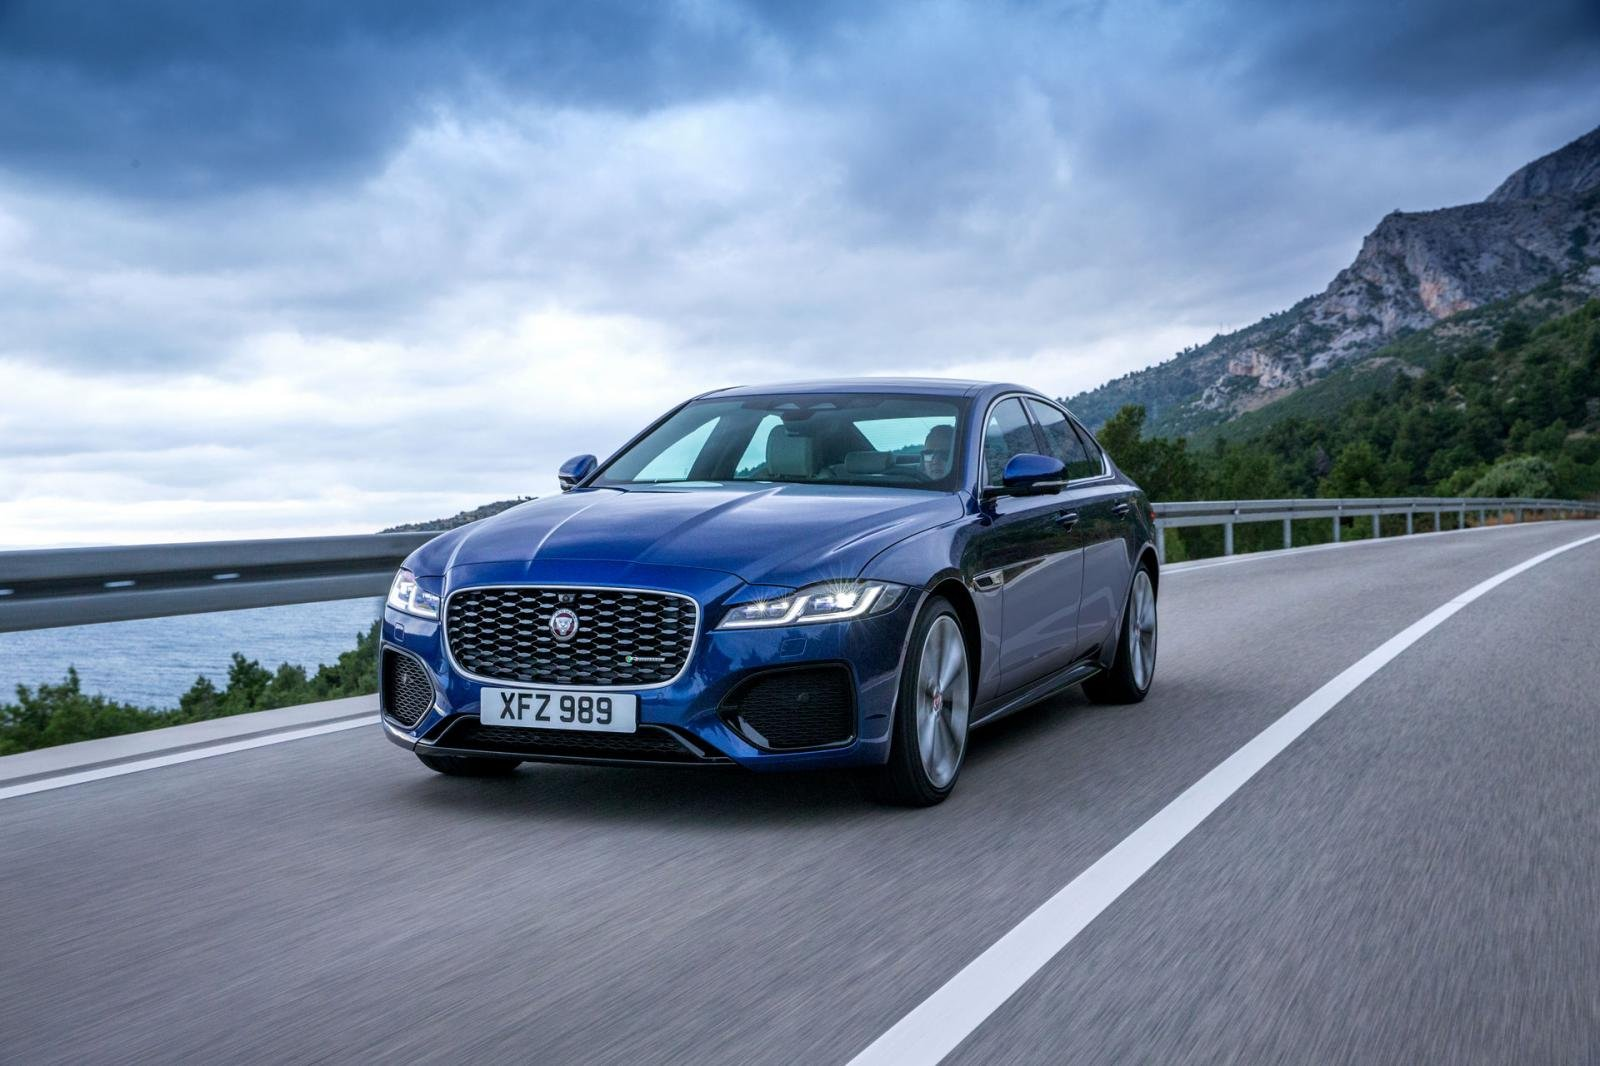 Xe ô tô Jaguar.